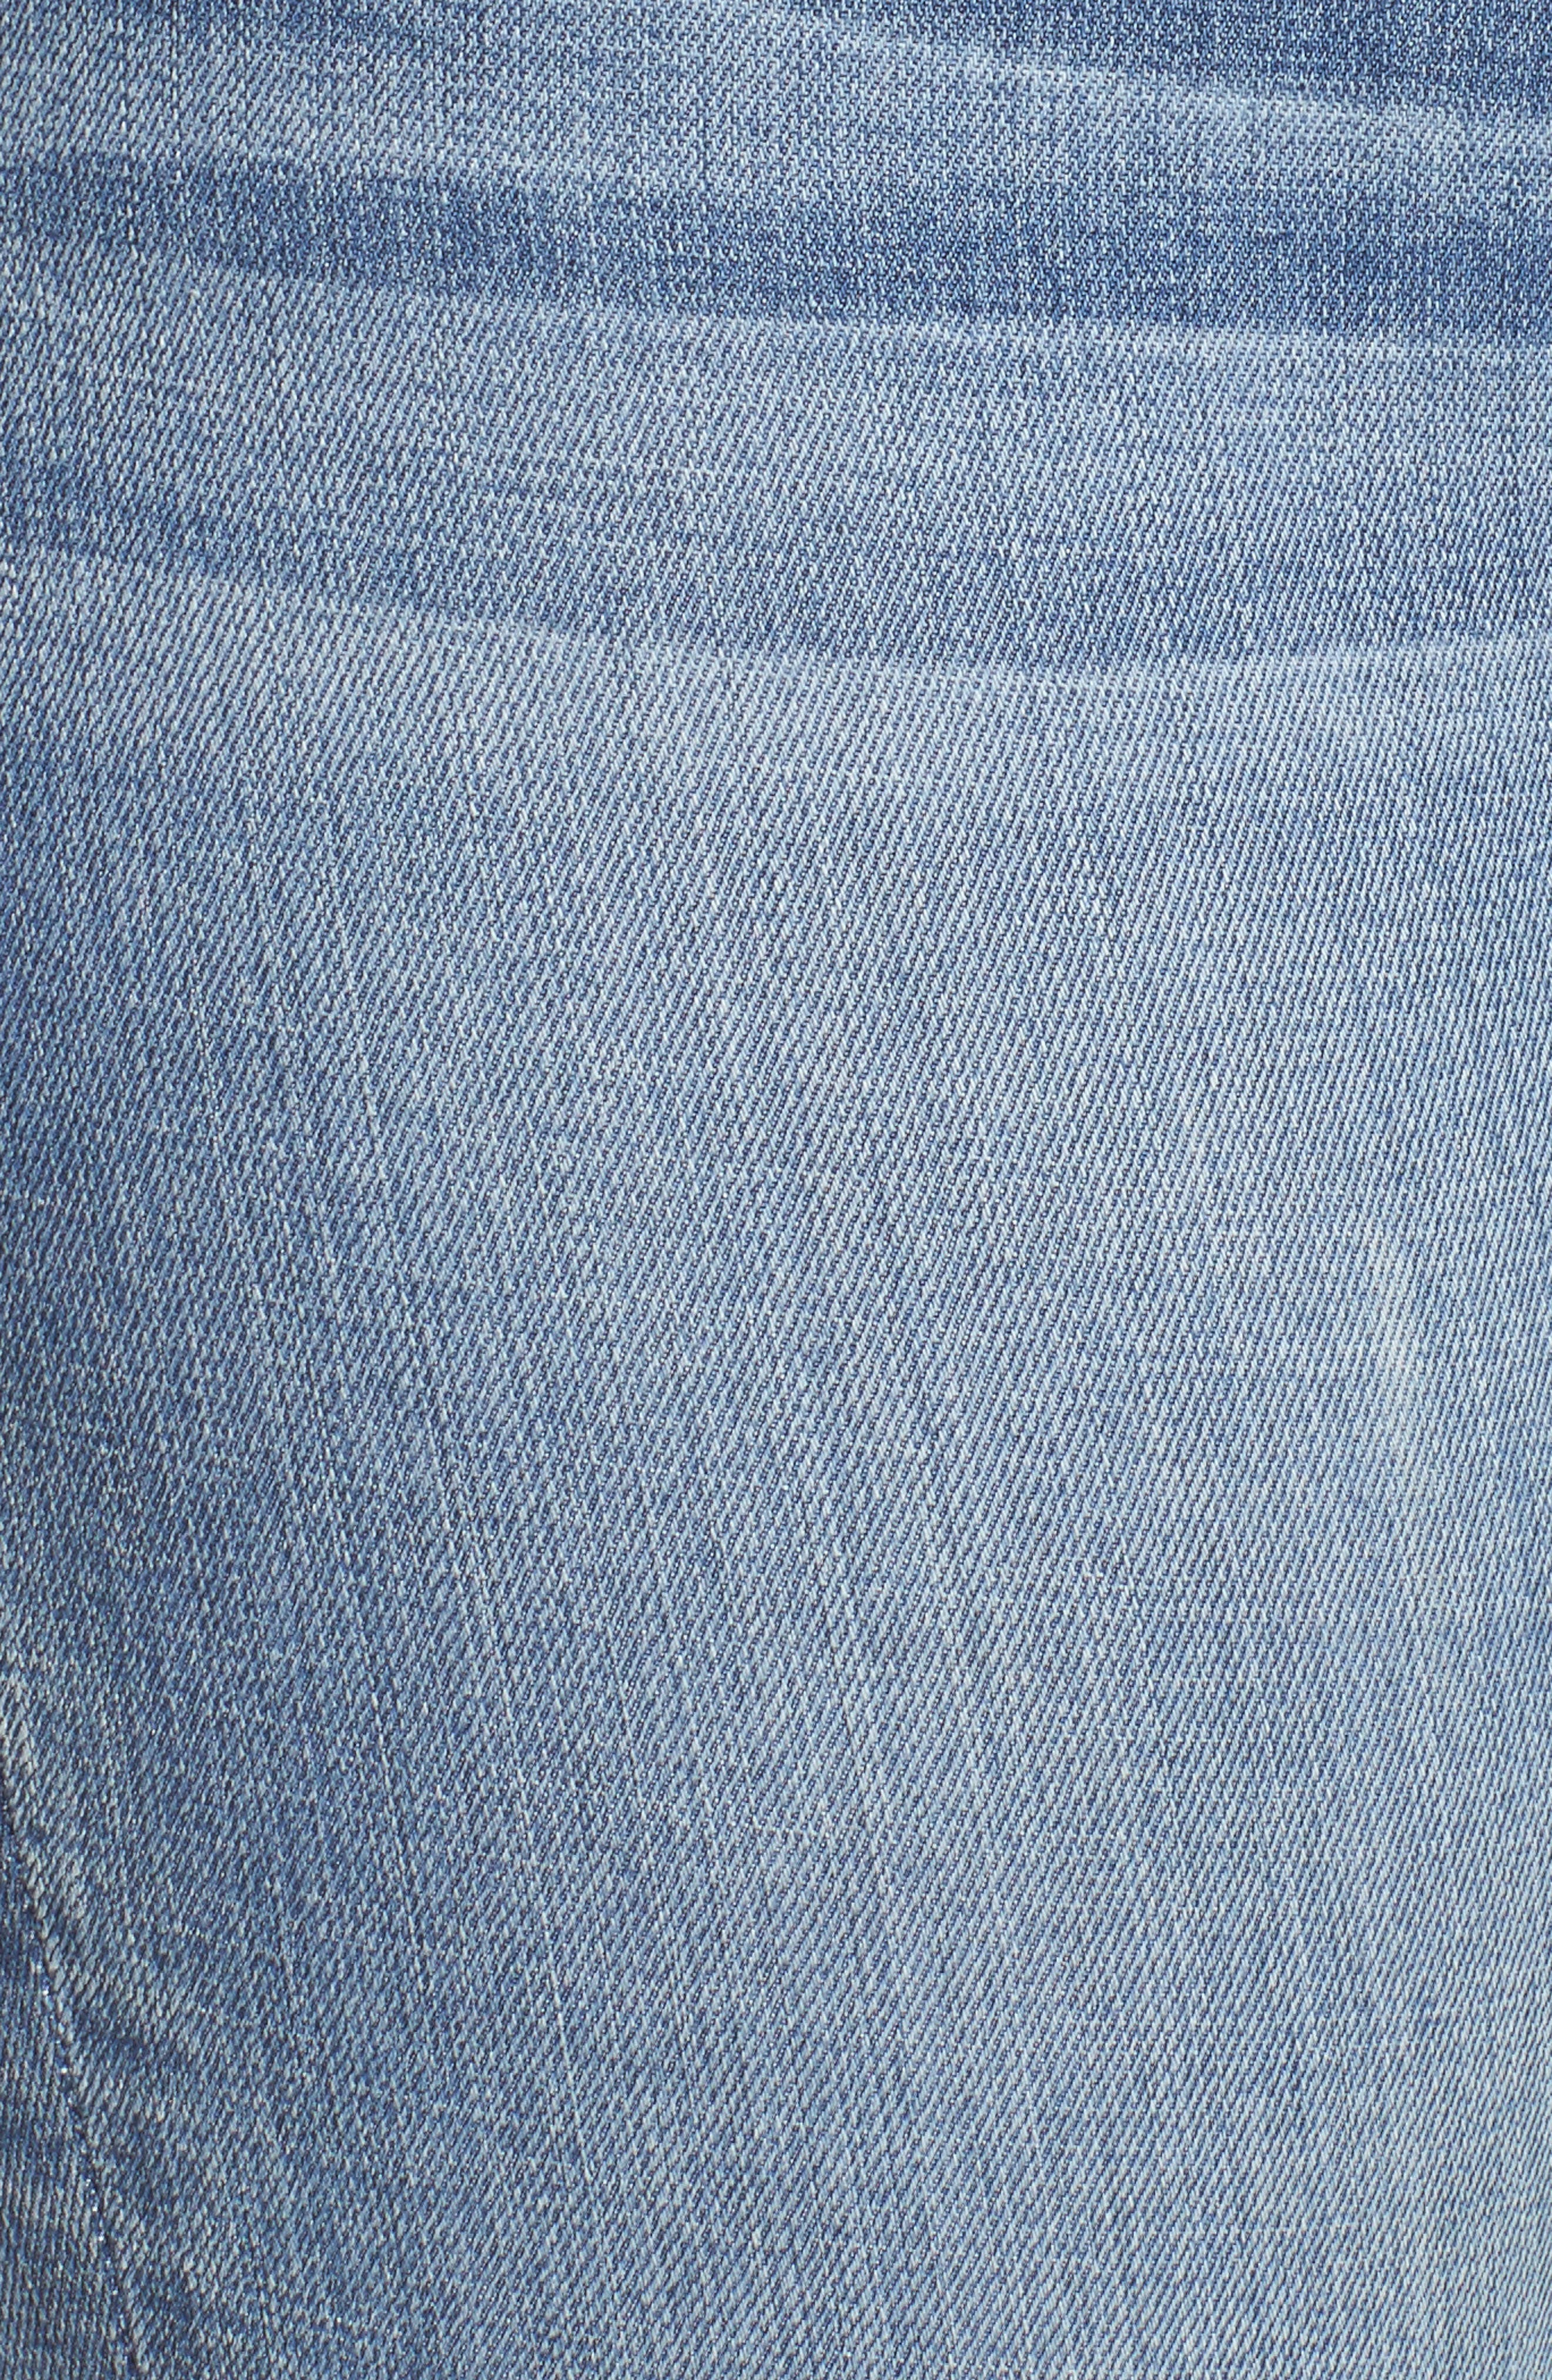 Alternate Image 13  - Good American Good Straight High Rise Jeans (Blue 087) (Regular & Plus Size)